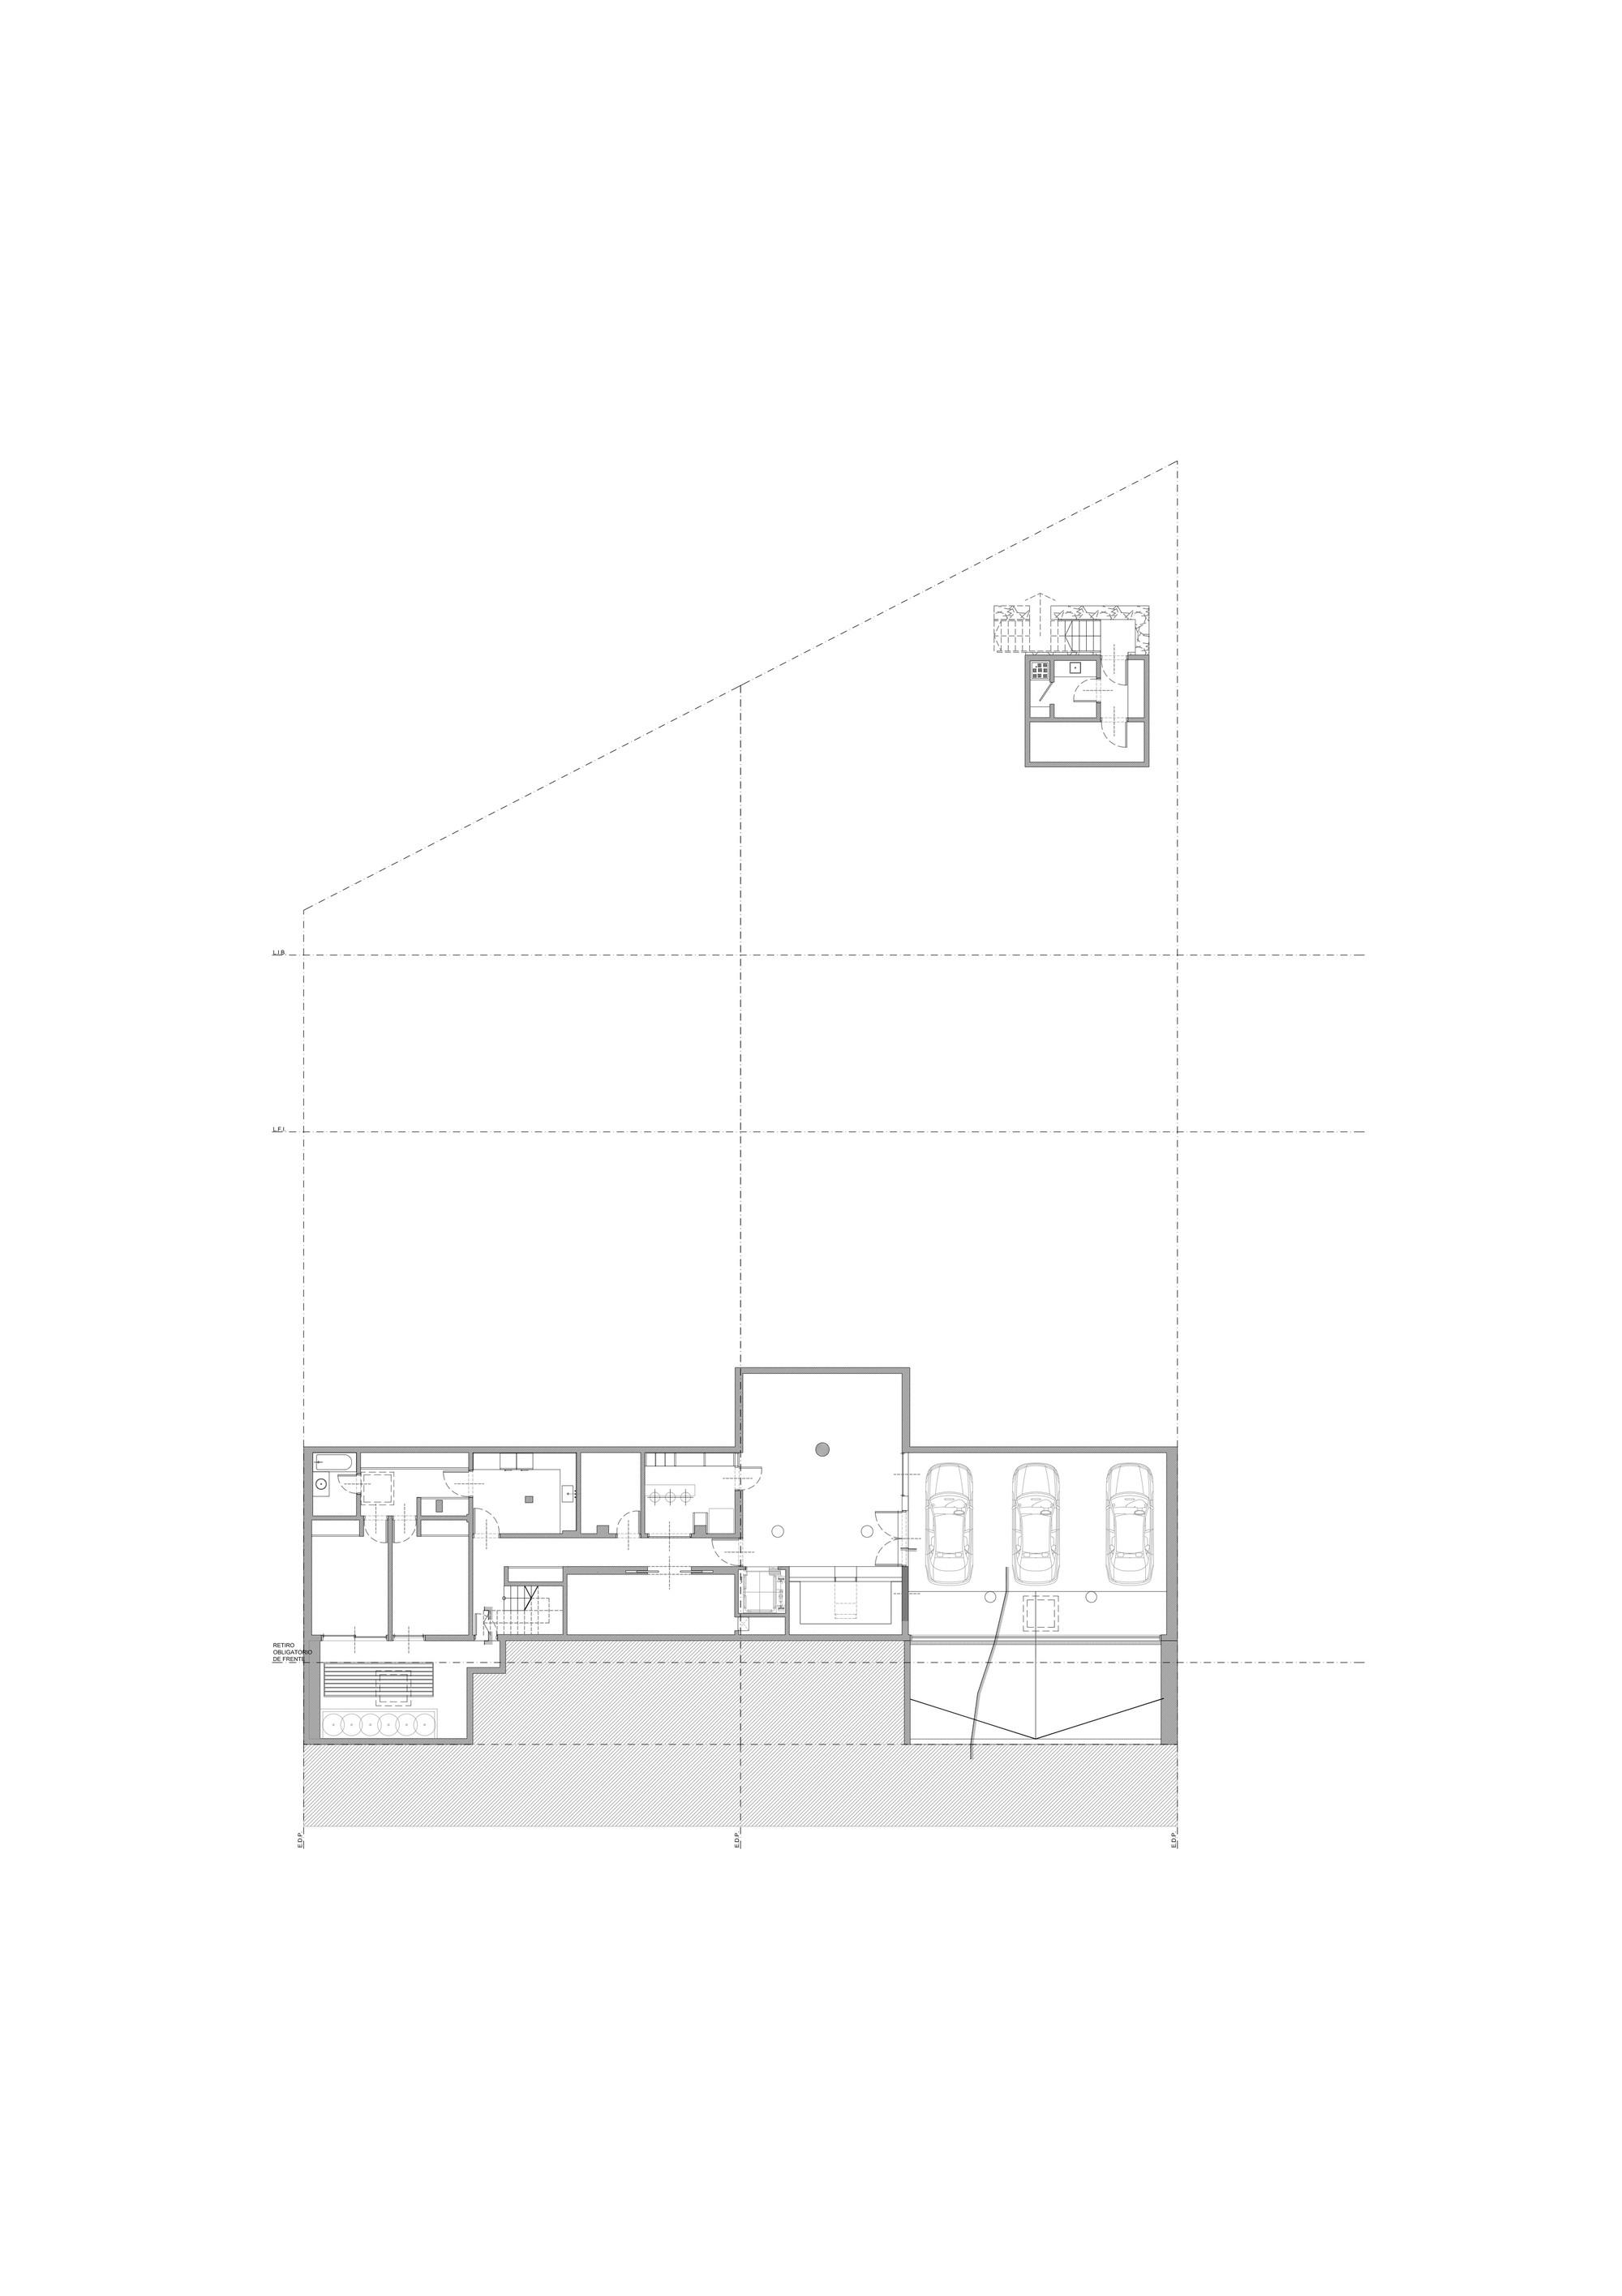 Gallery of pricila house estudio mart n g mez arquitectos 14 - Maison pricila martin gomez ...